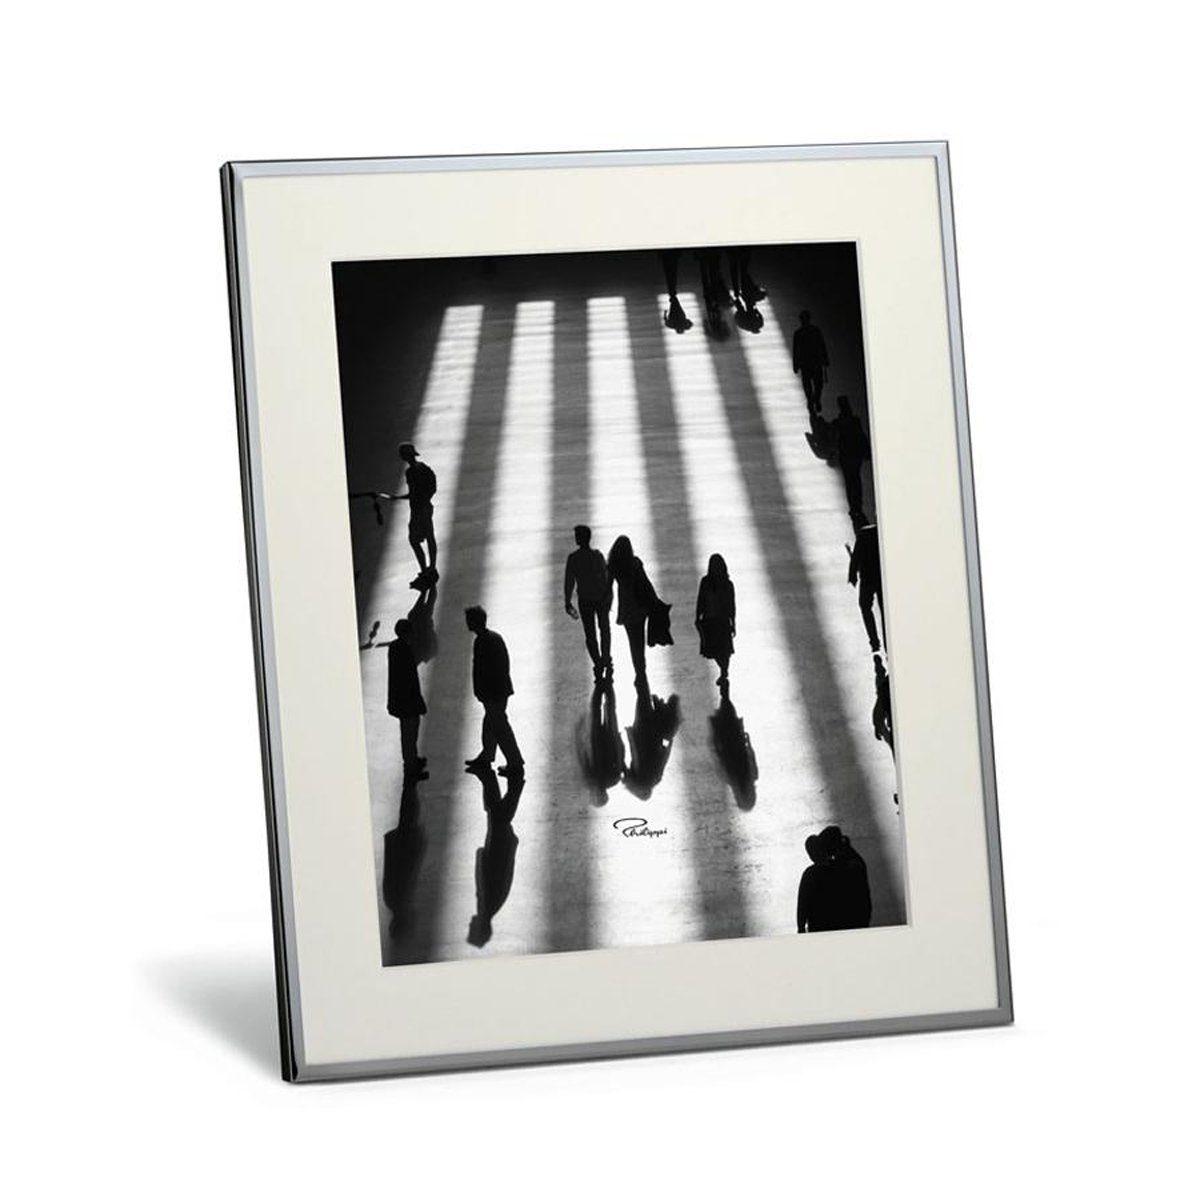 PHILIPPI Philippi Bilderrahmen SHADOW 20x25 cm